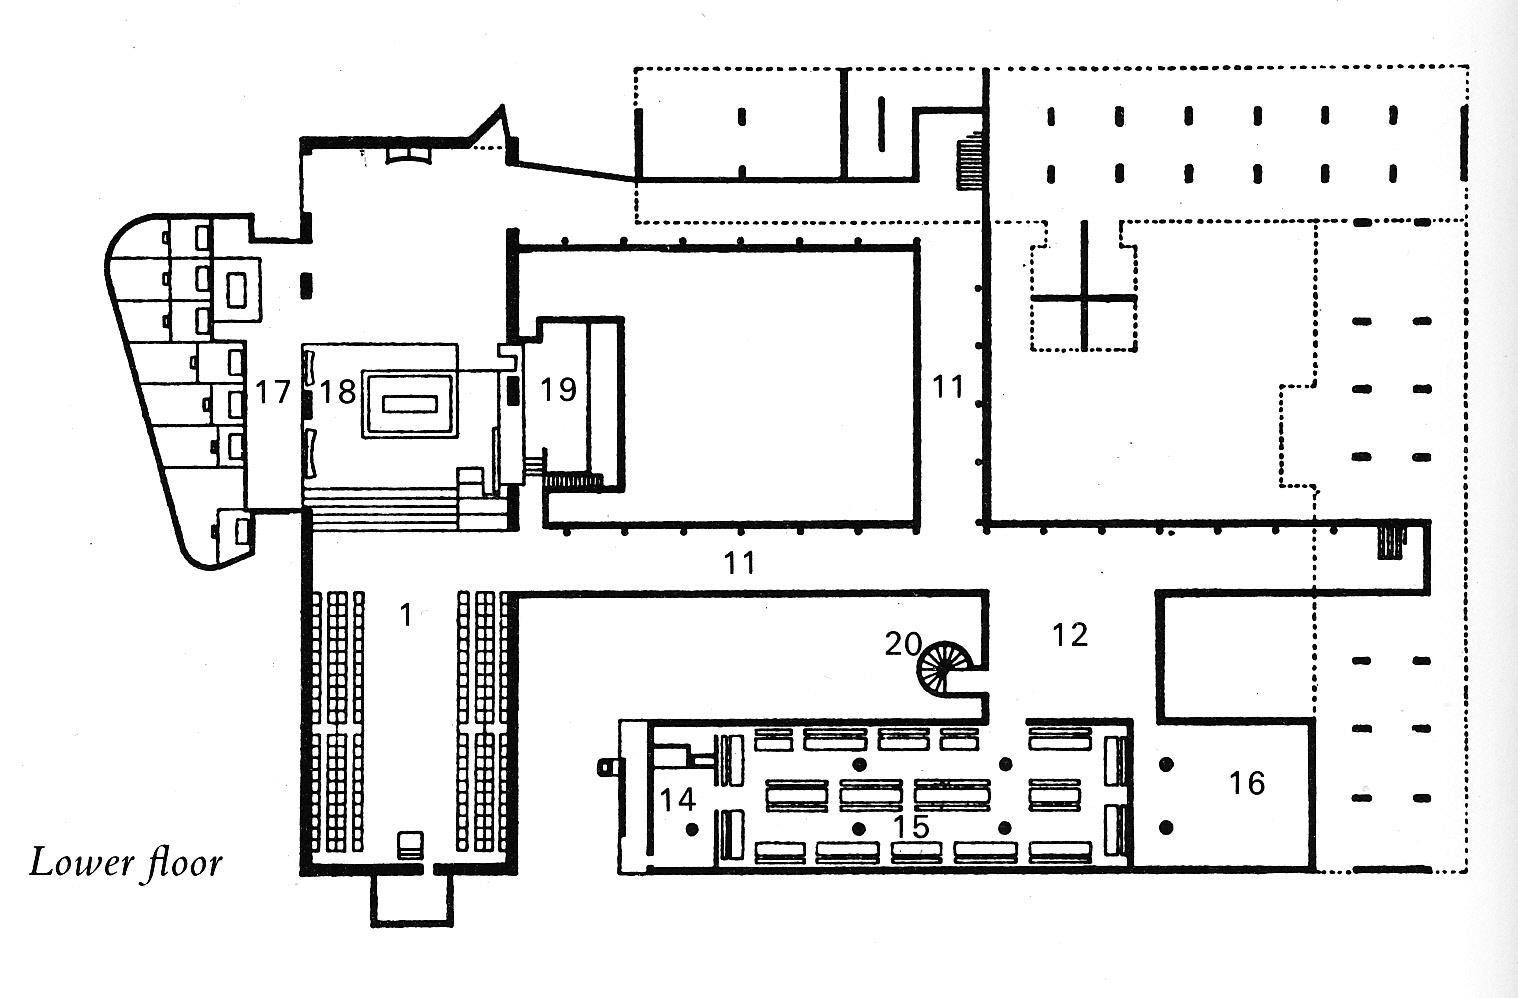 Floor Plans With Courtyard Voussoirs Corbusier Renaissance Man